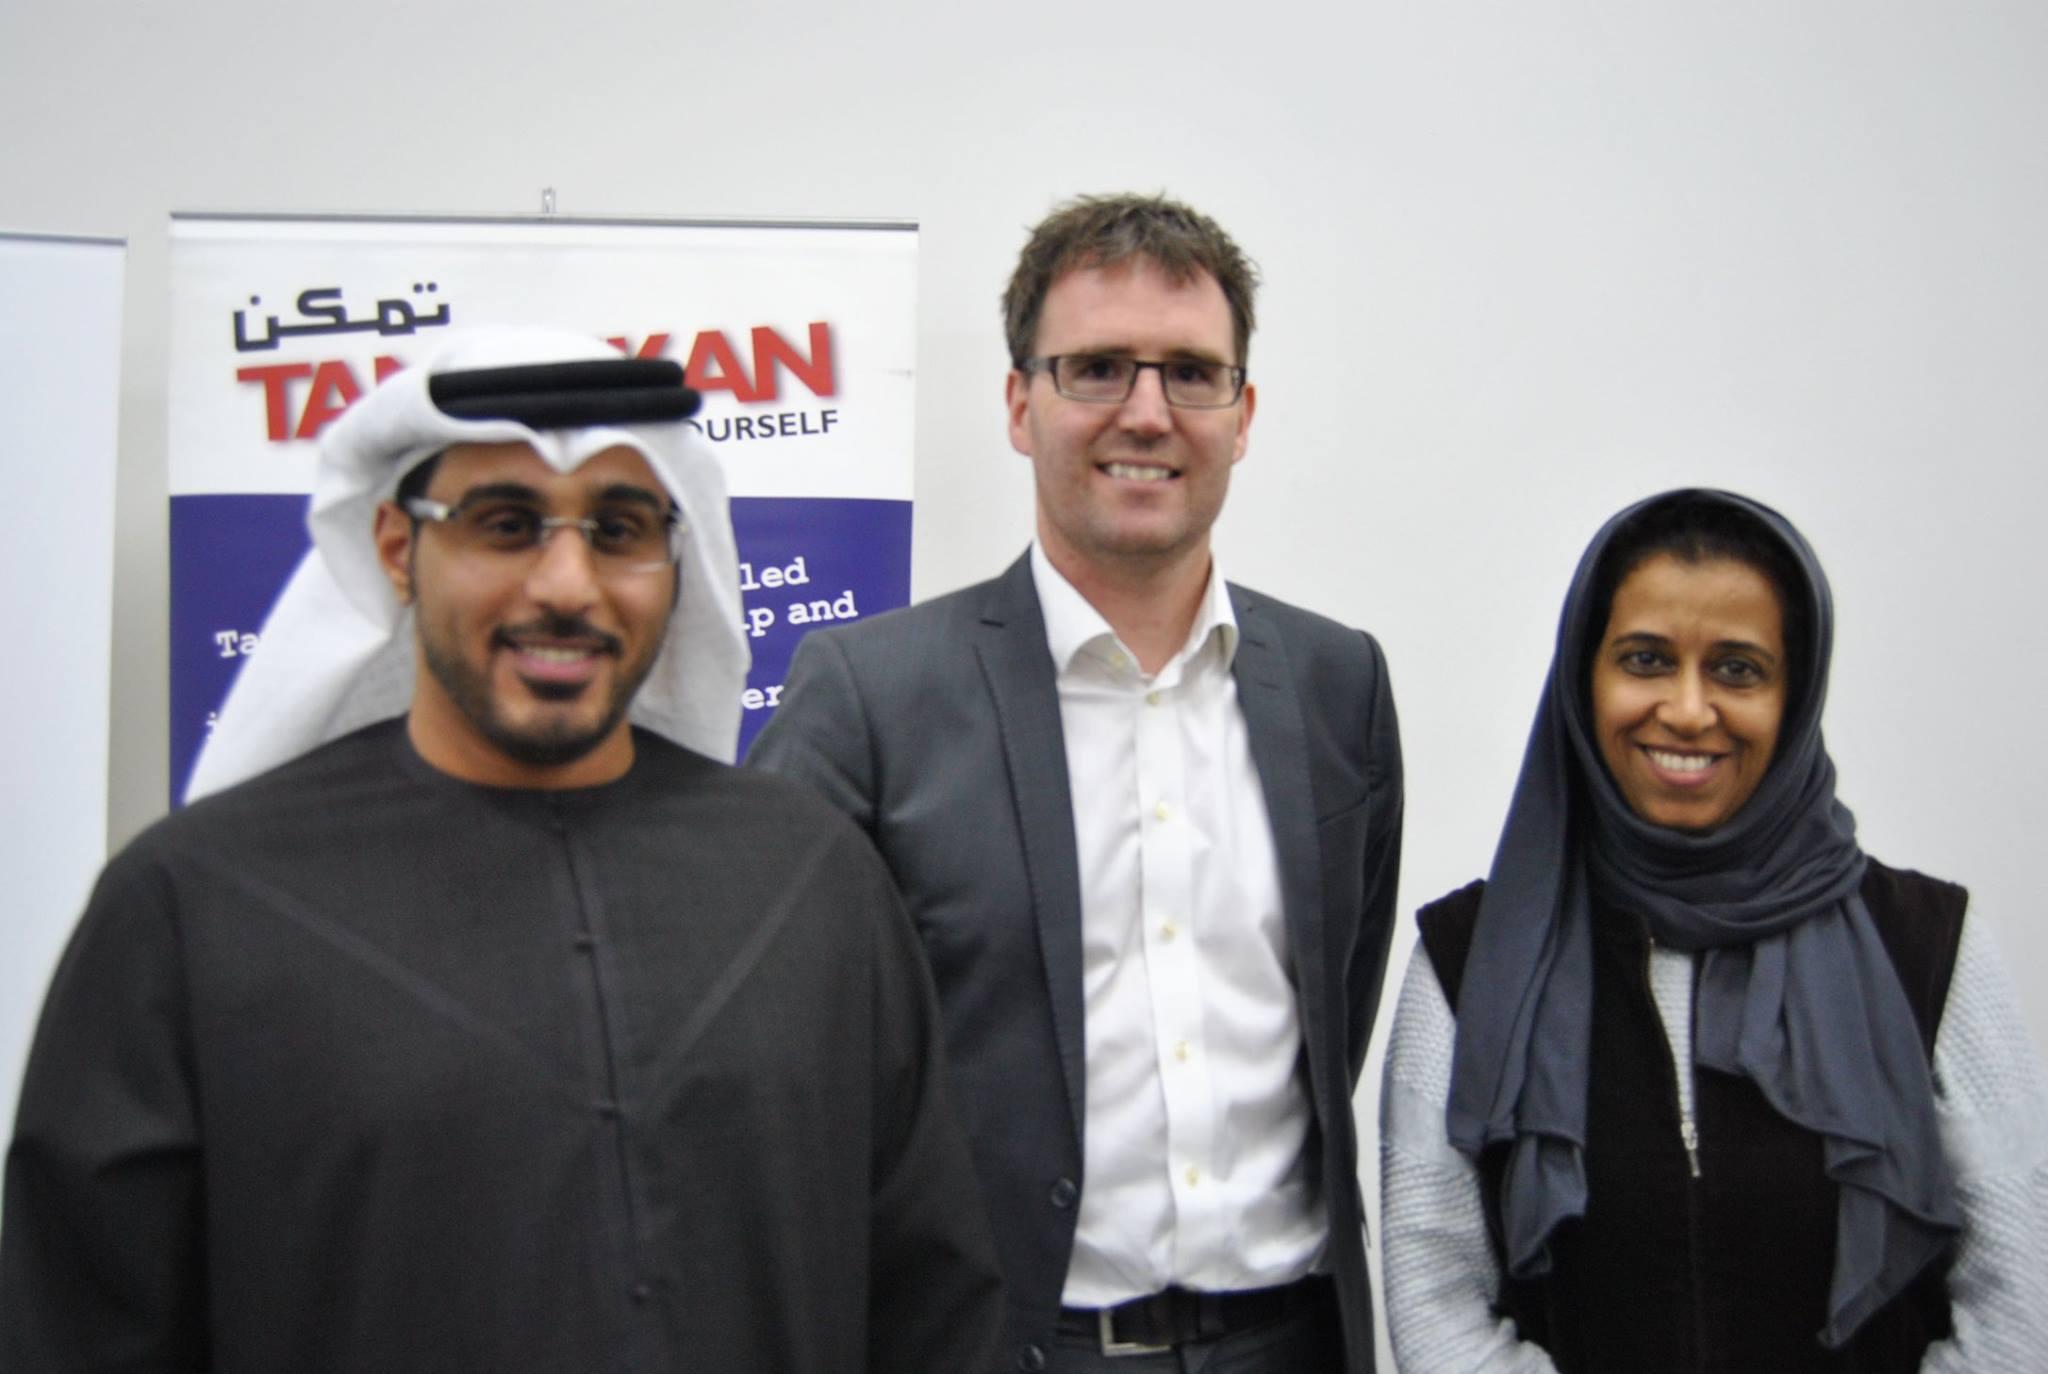 Abu Dhabi spearheads the Creative Maker Movement